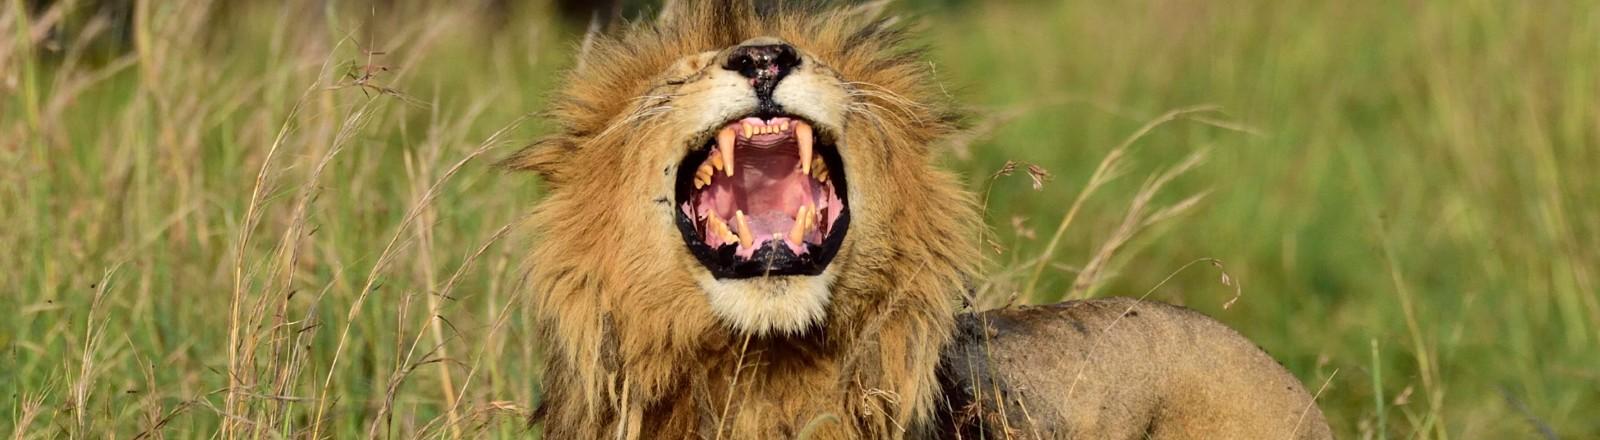 Ein Löwe brüllt.